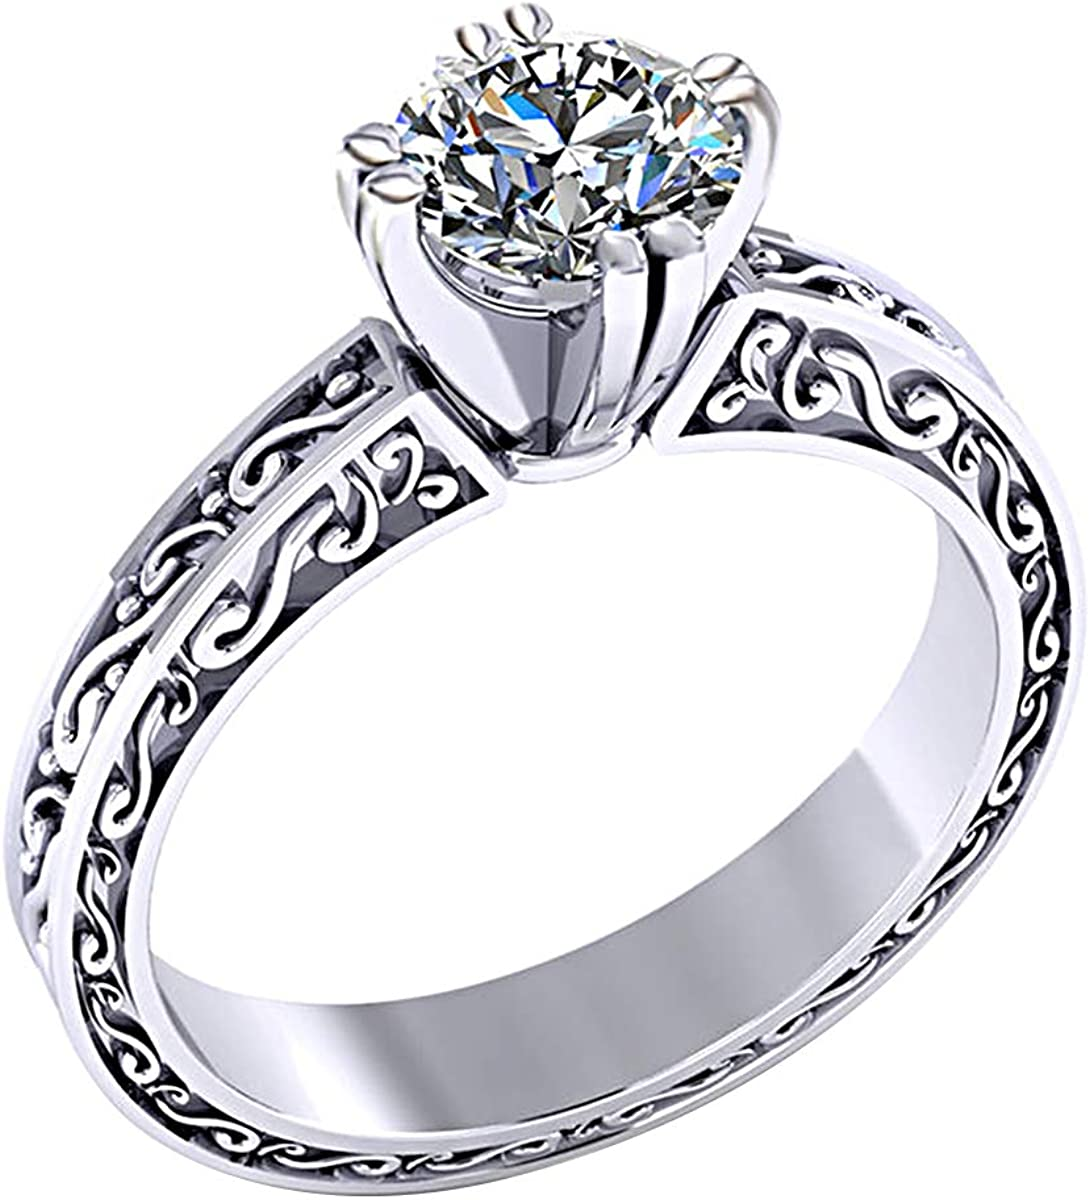 Vintage Art Deco Engagement Ring 14k White Gold 2.26 Carat White Round Diamond